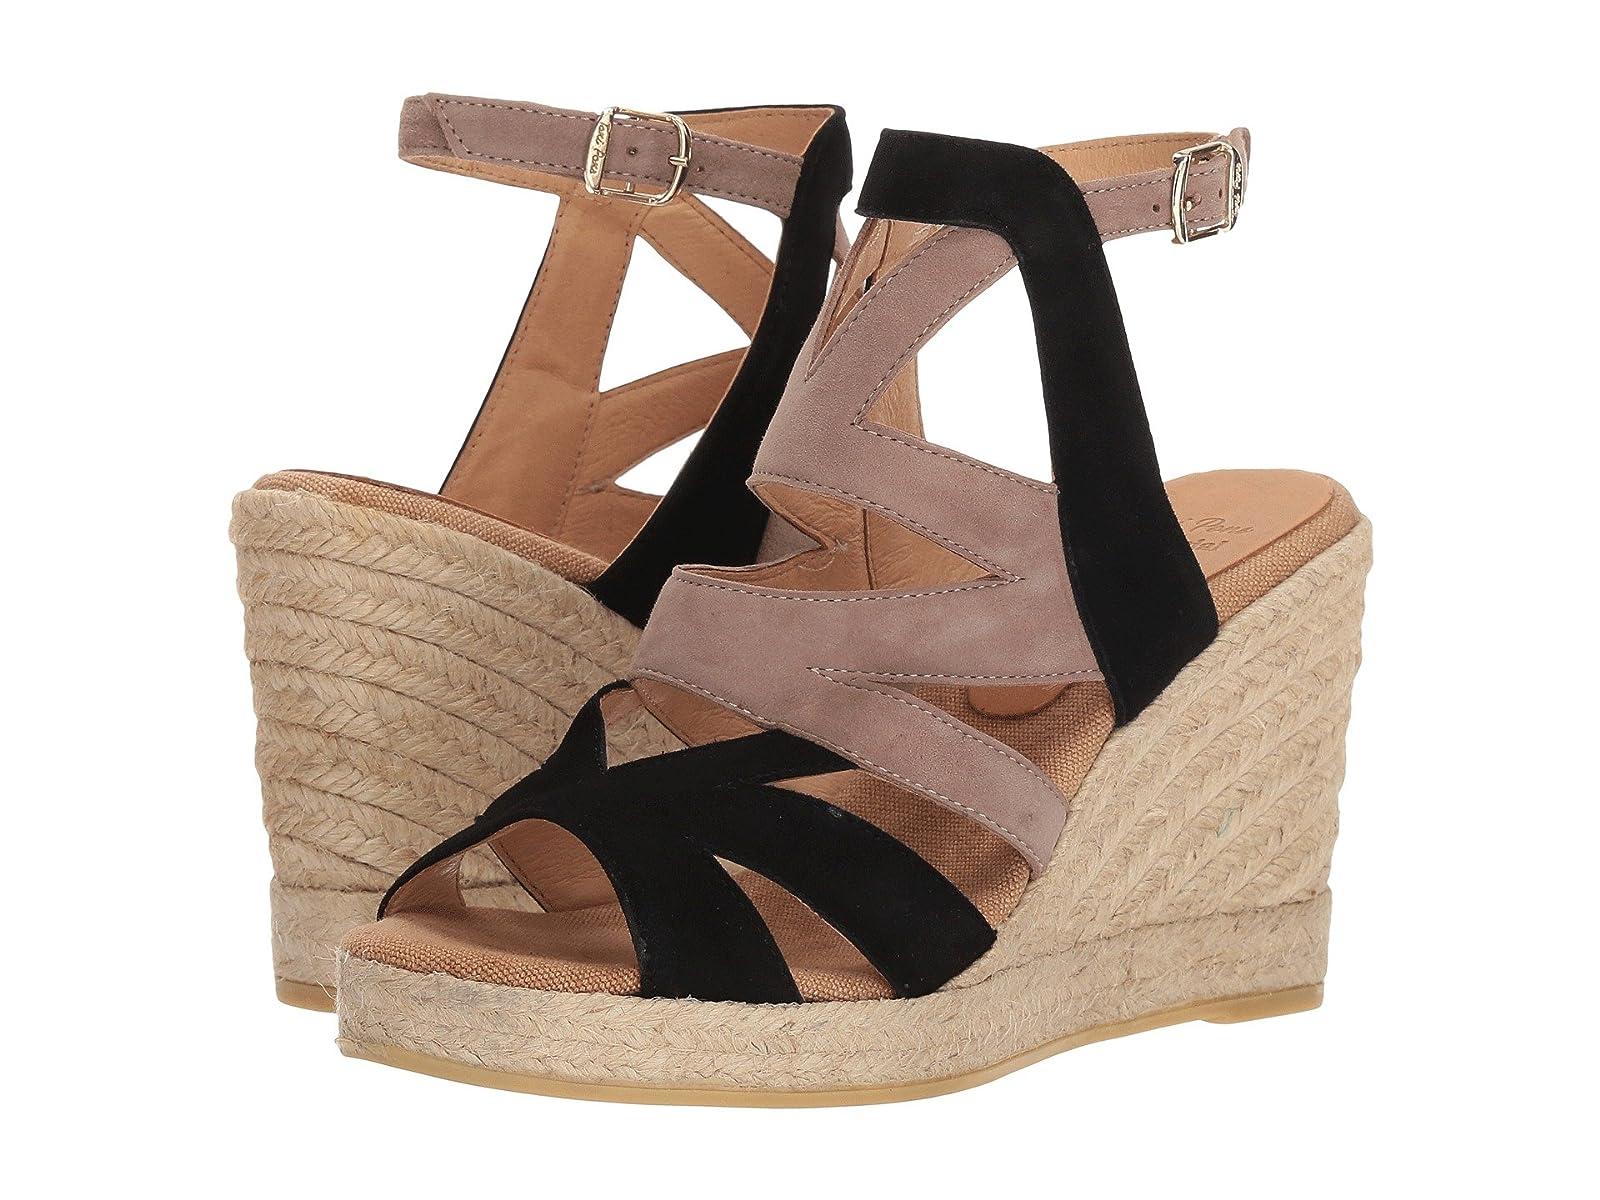 Toni Pons MirnaAtmospheric grades have affordable shoes